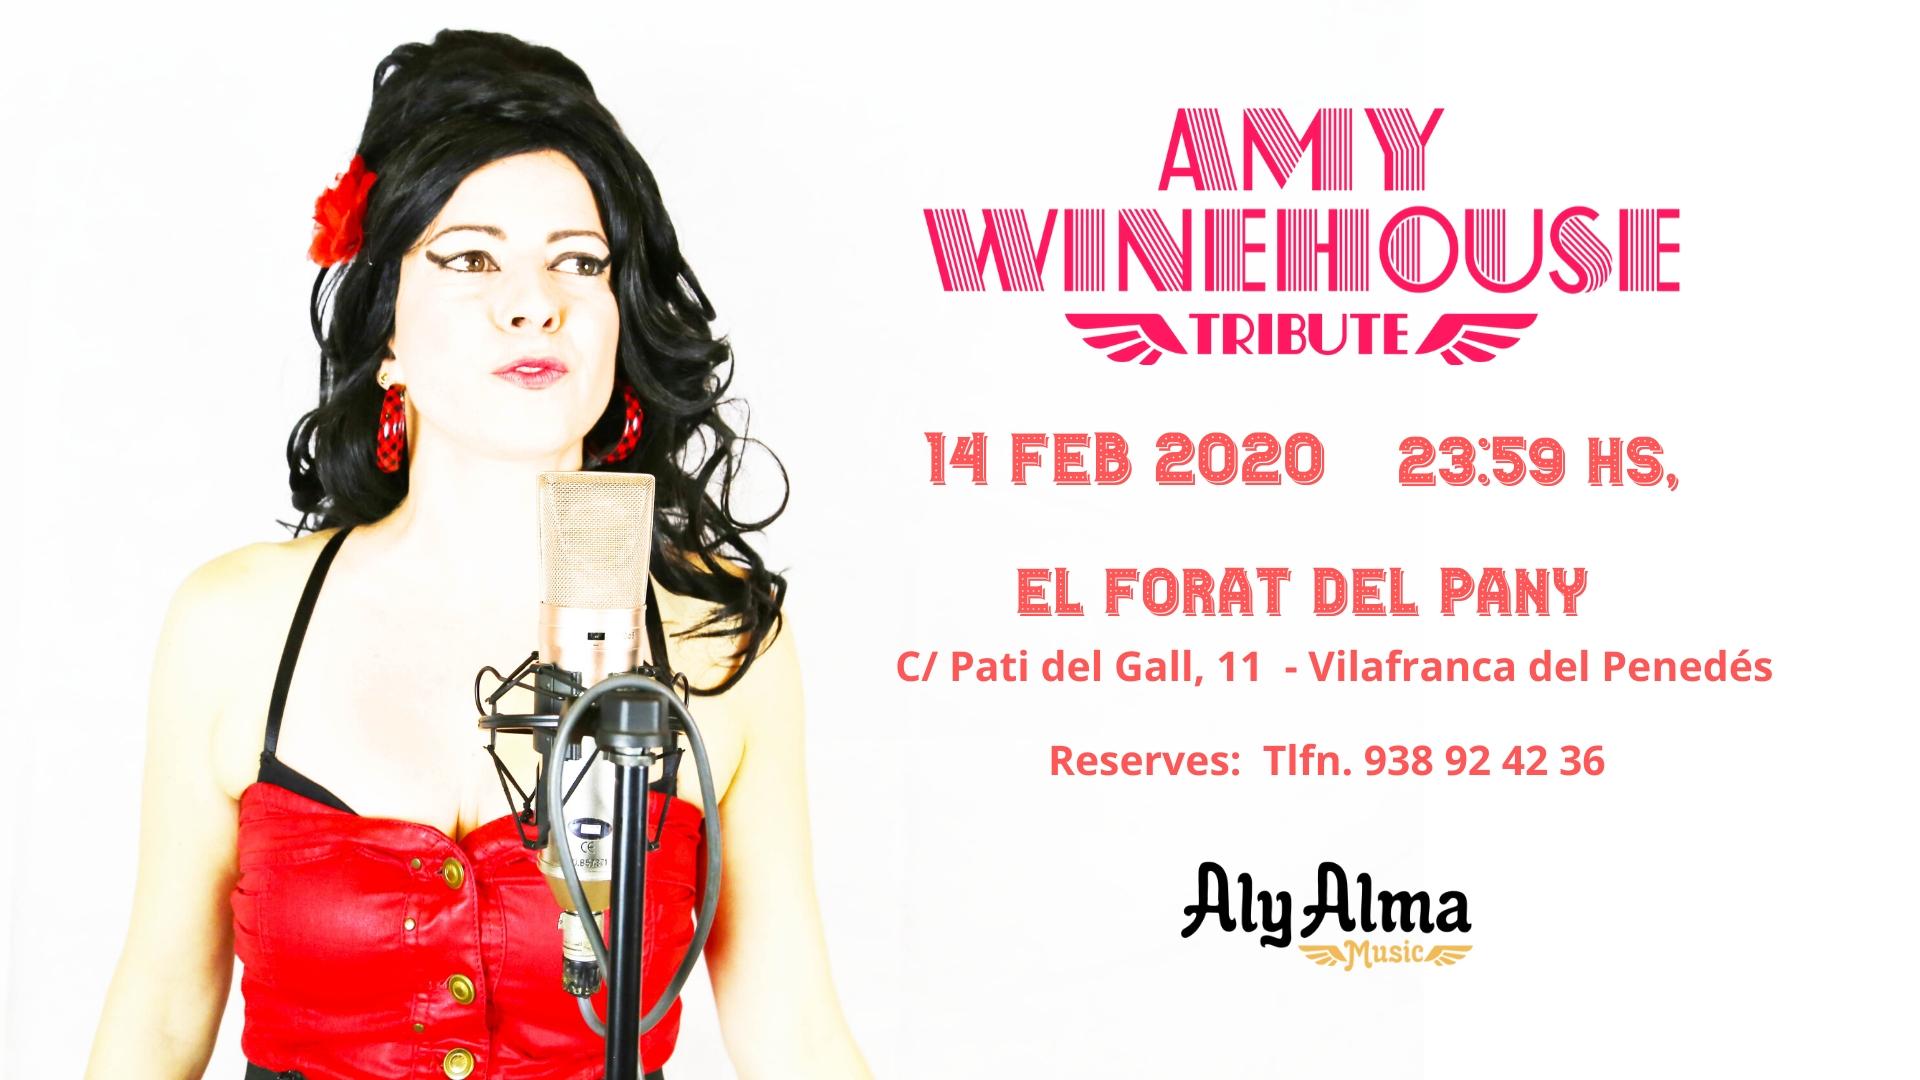 Amy Winehouse Tribute